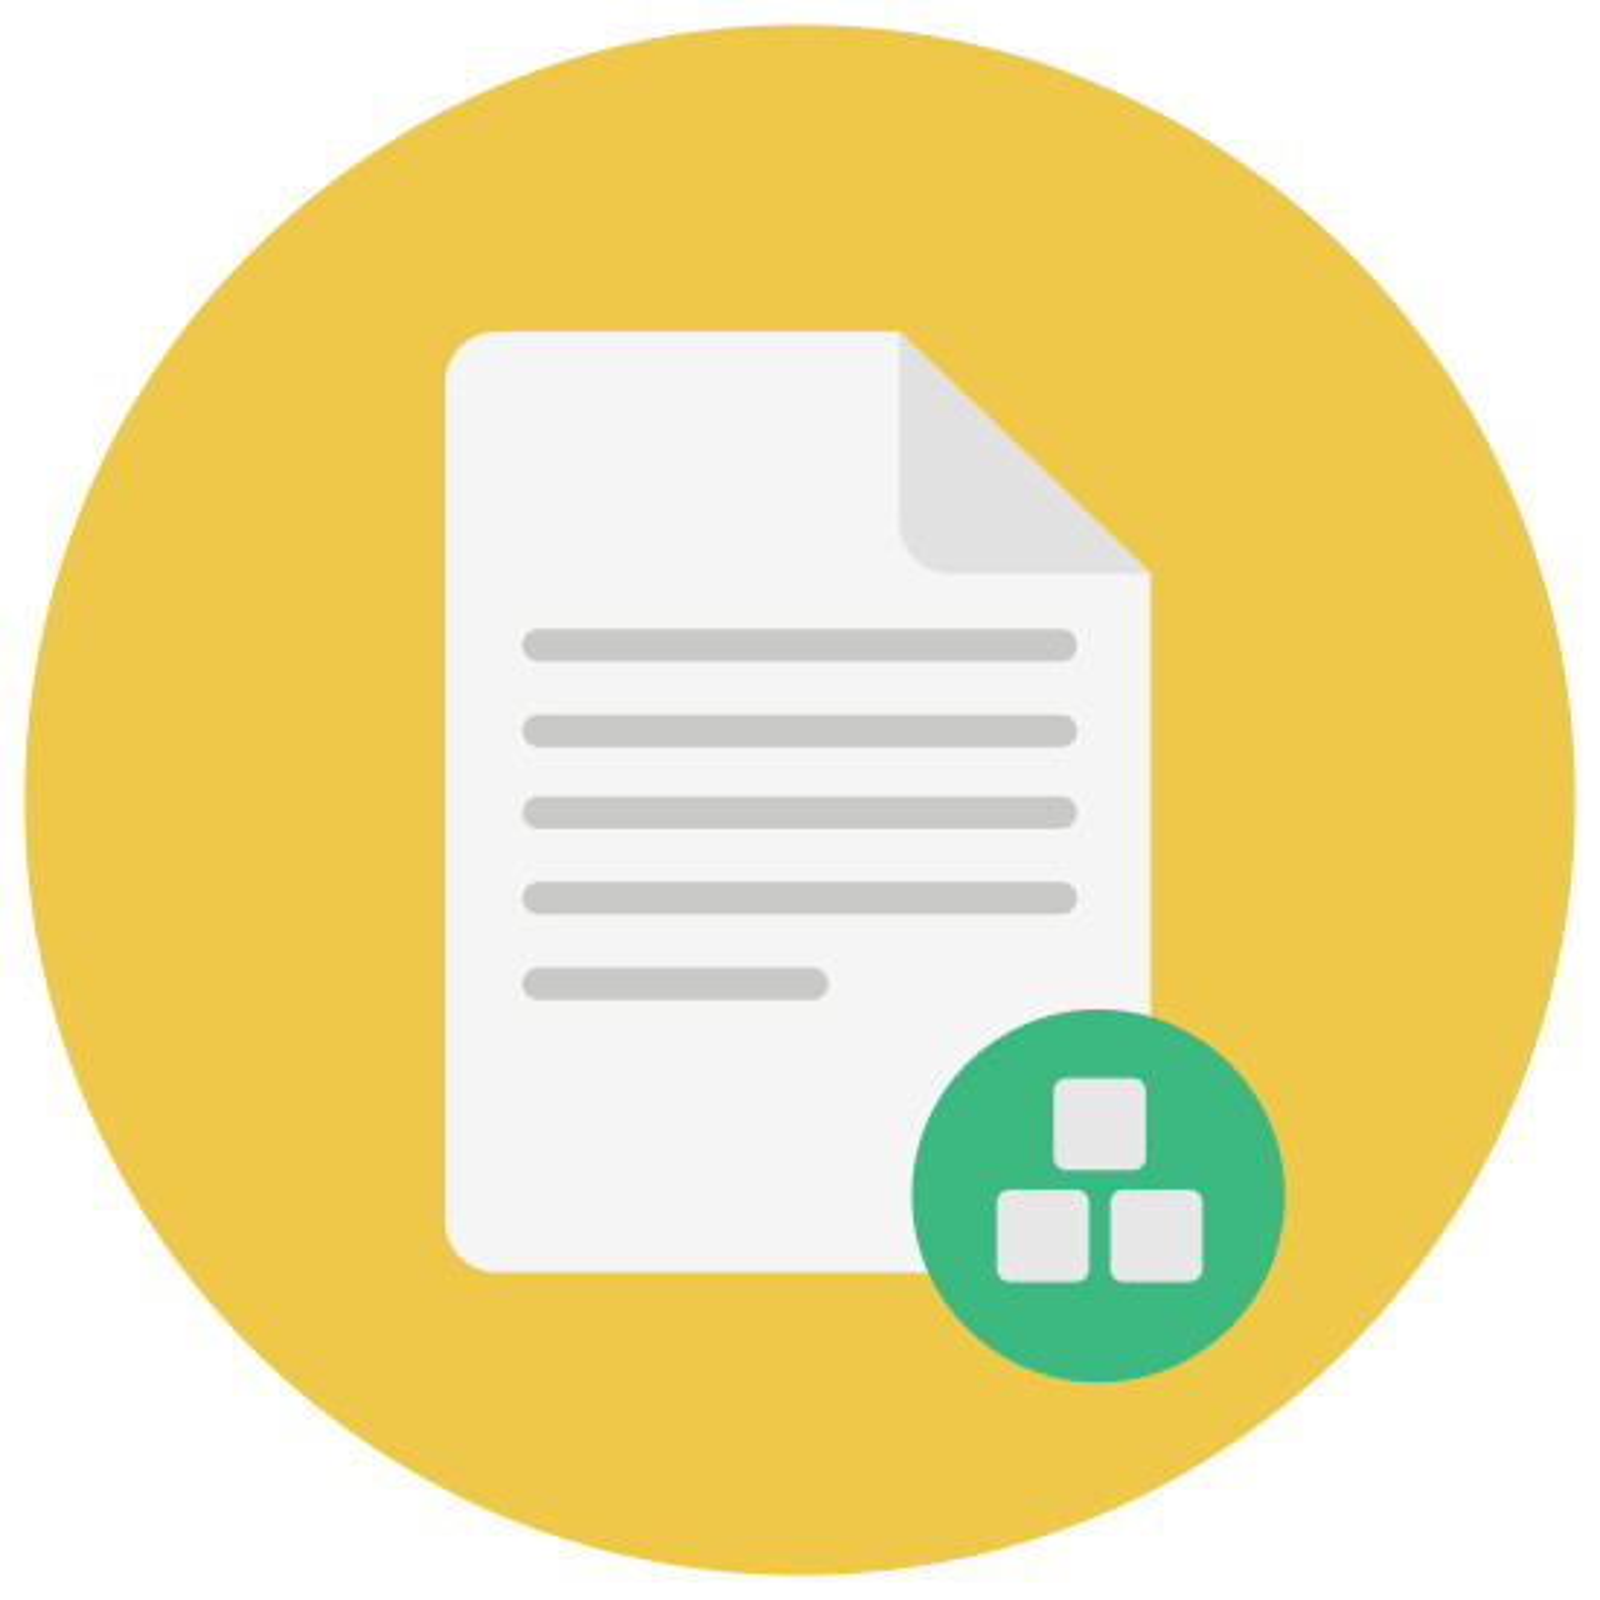 File Elements icon